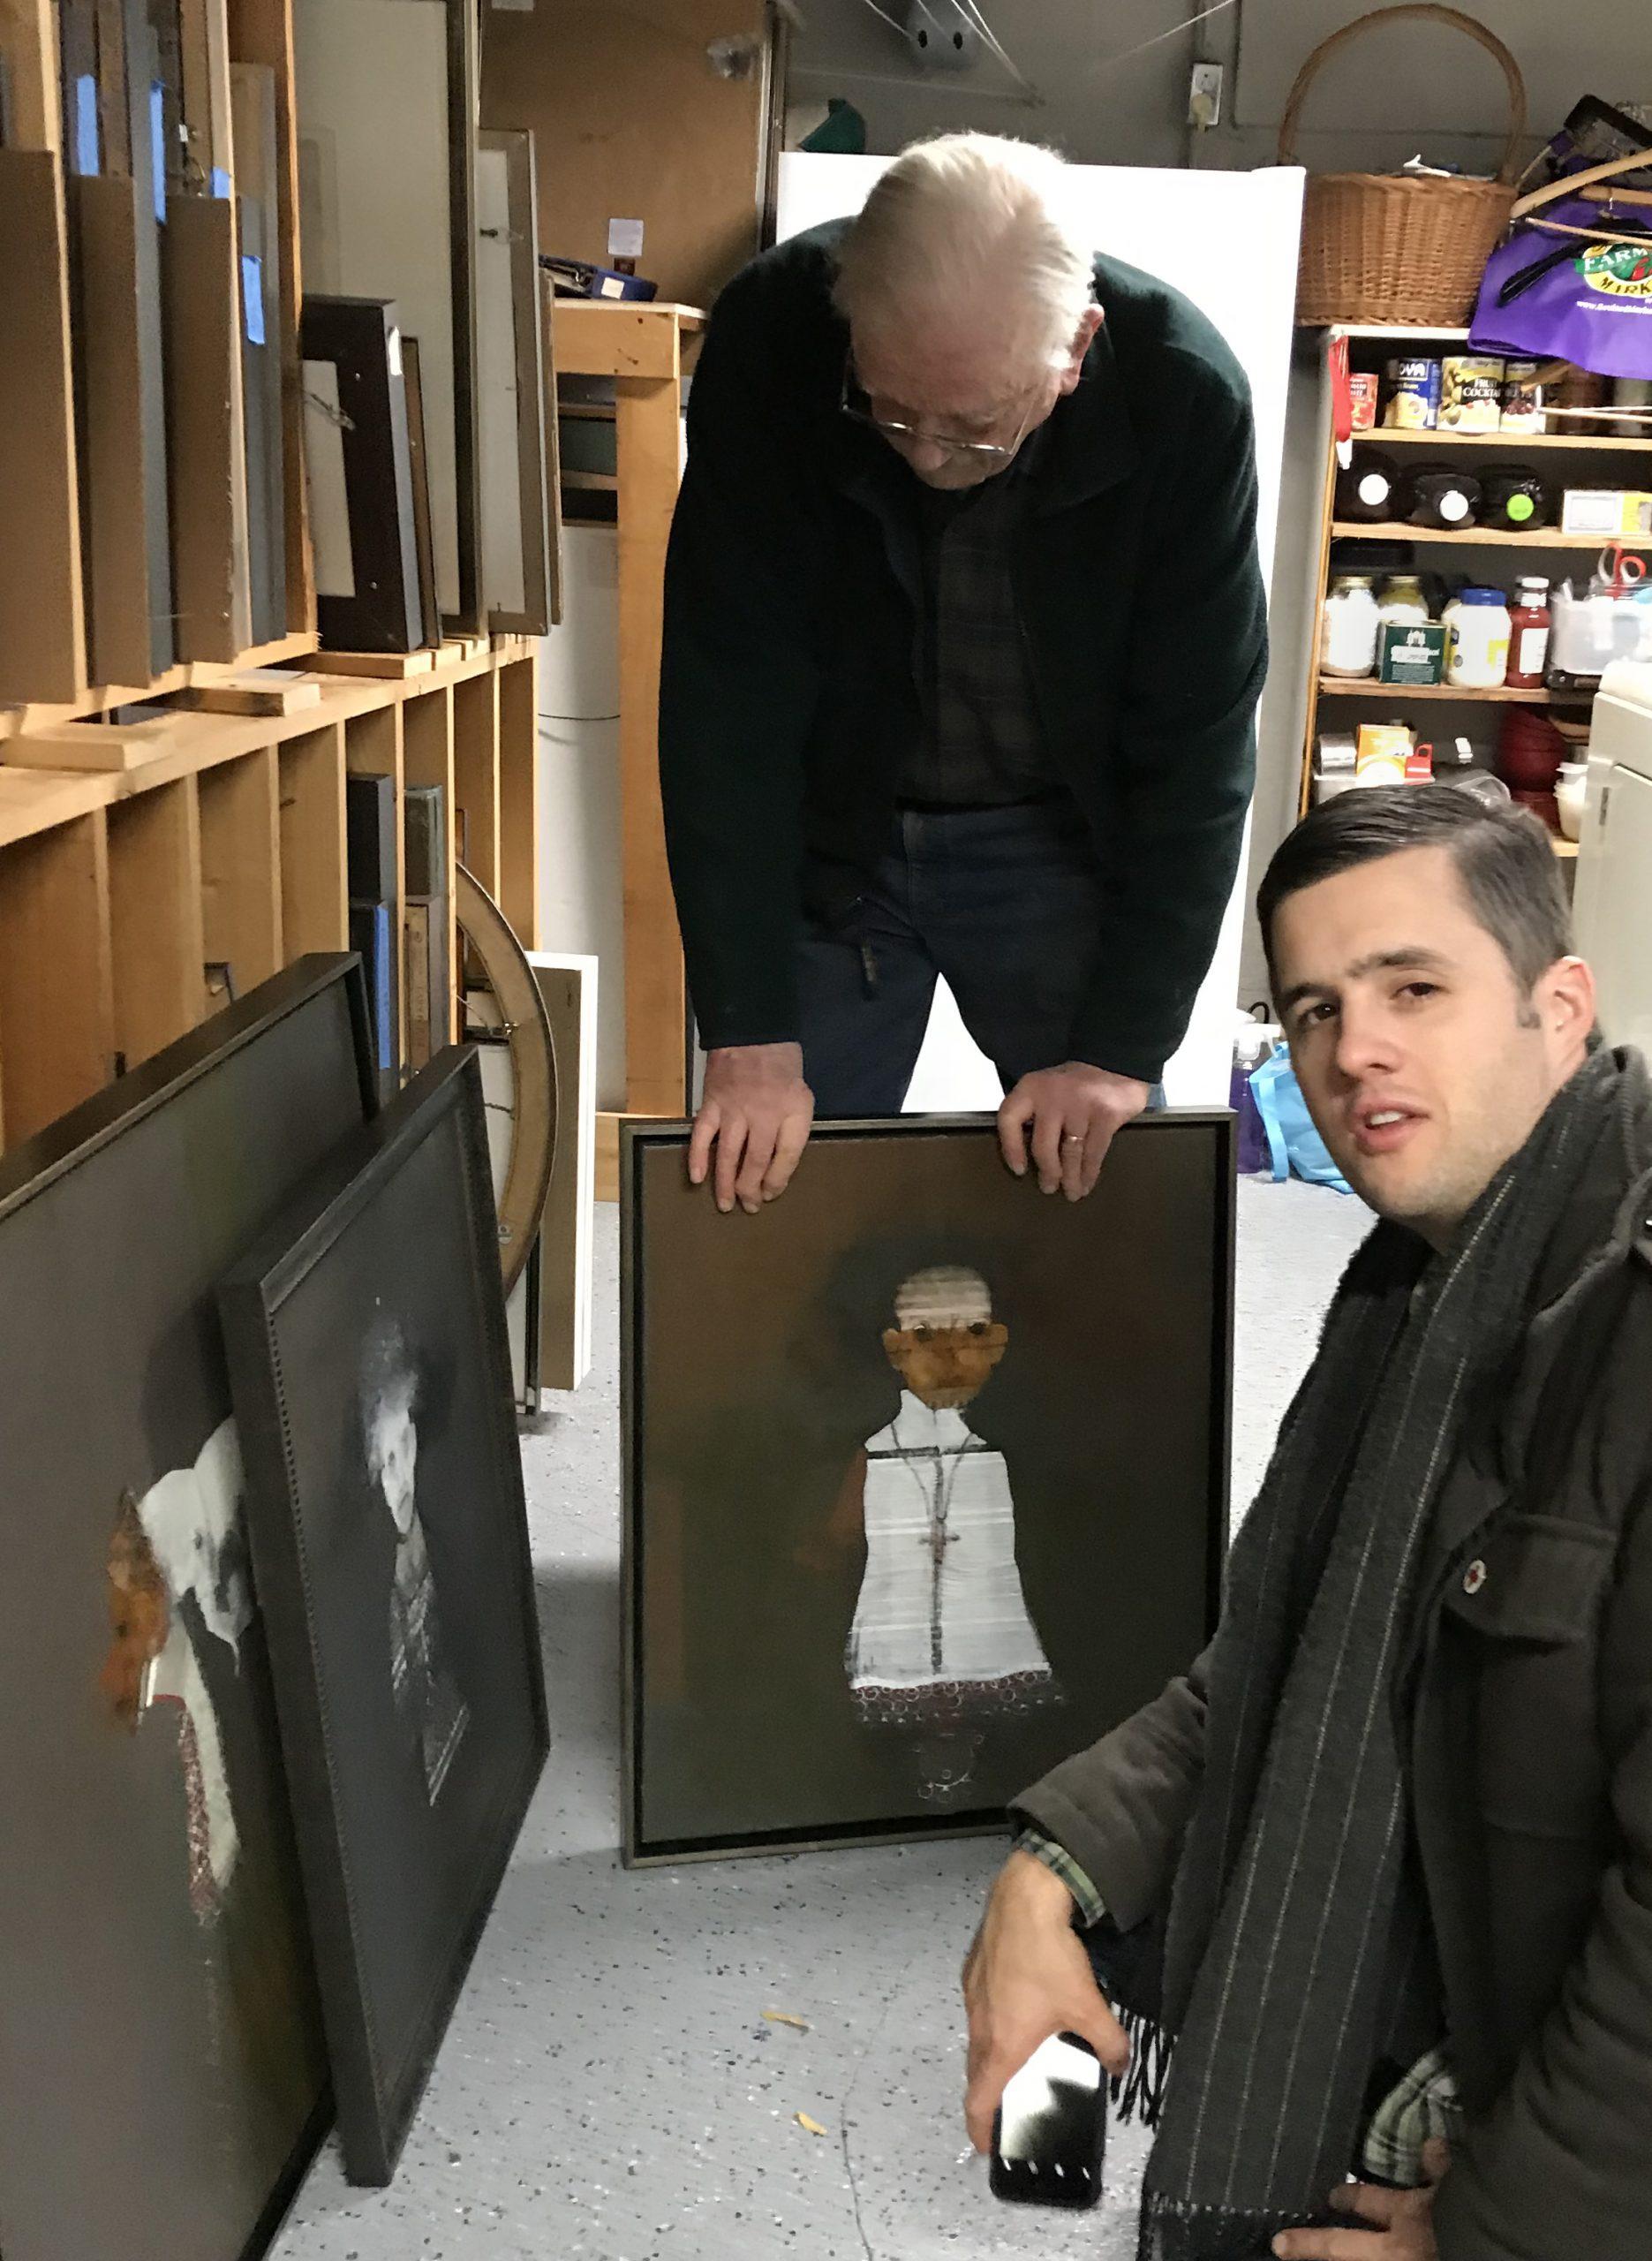 Artist and curator in artist studio